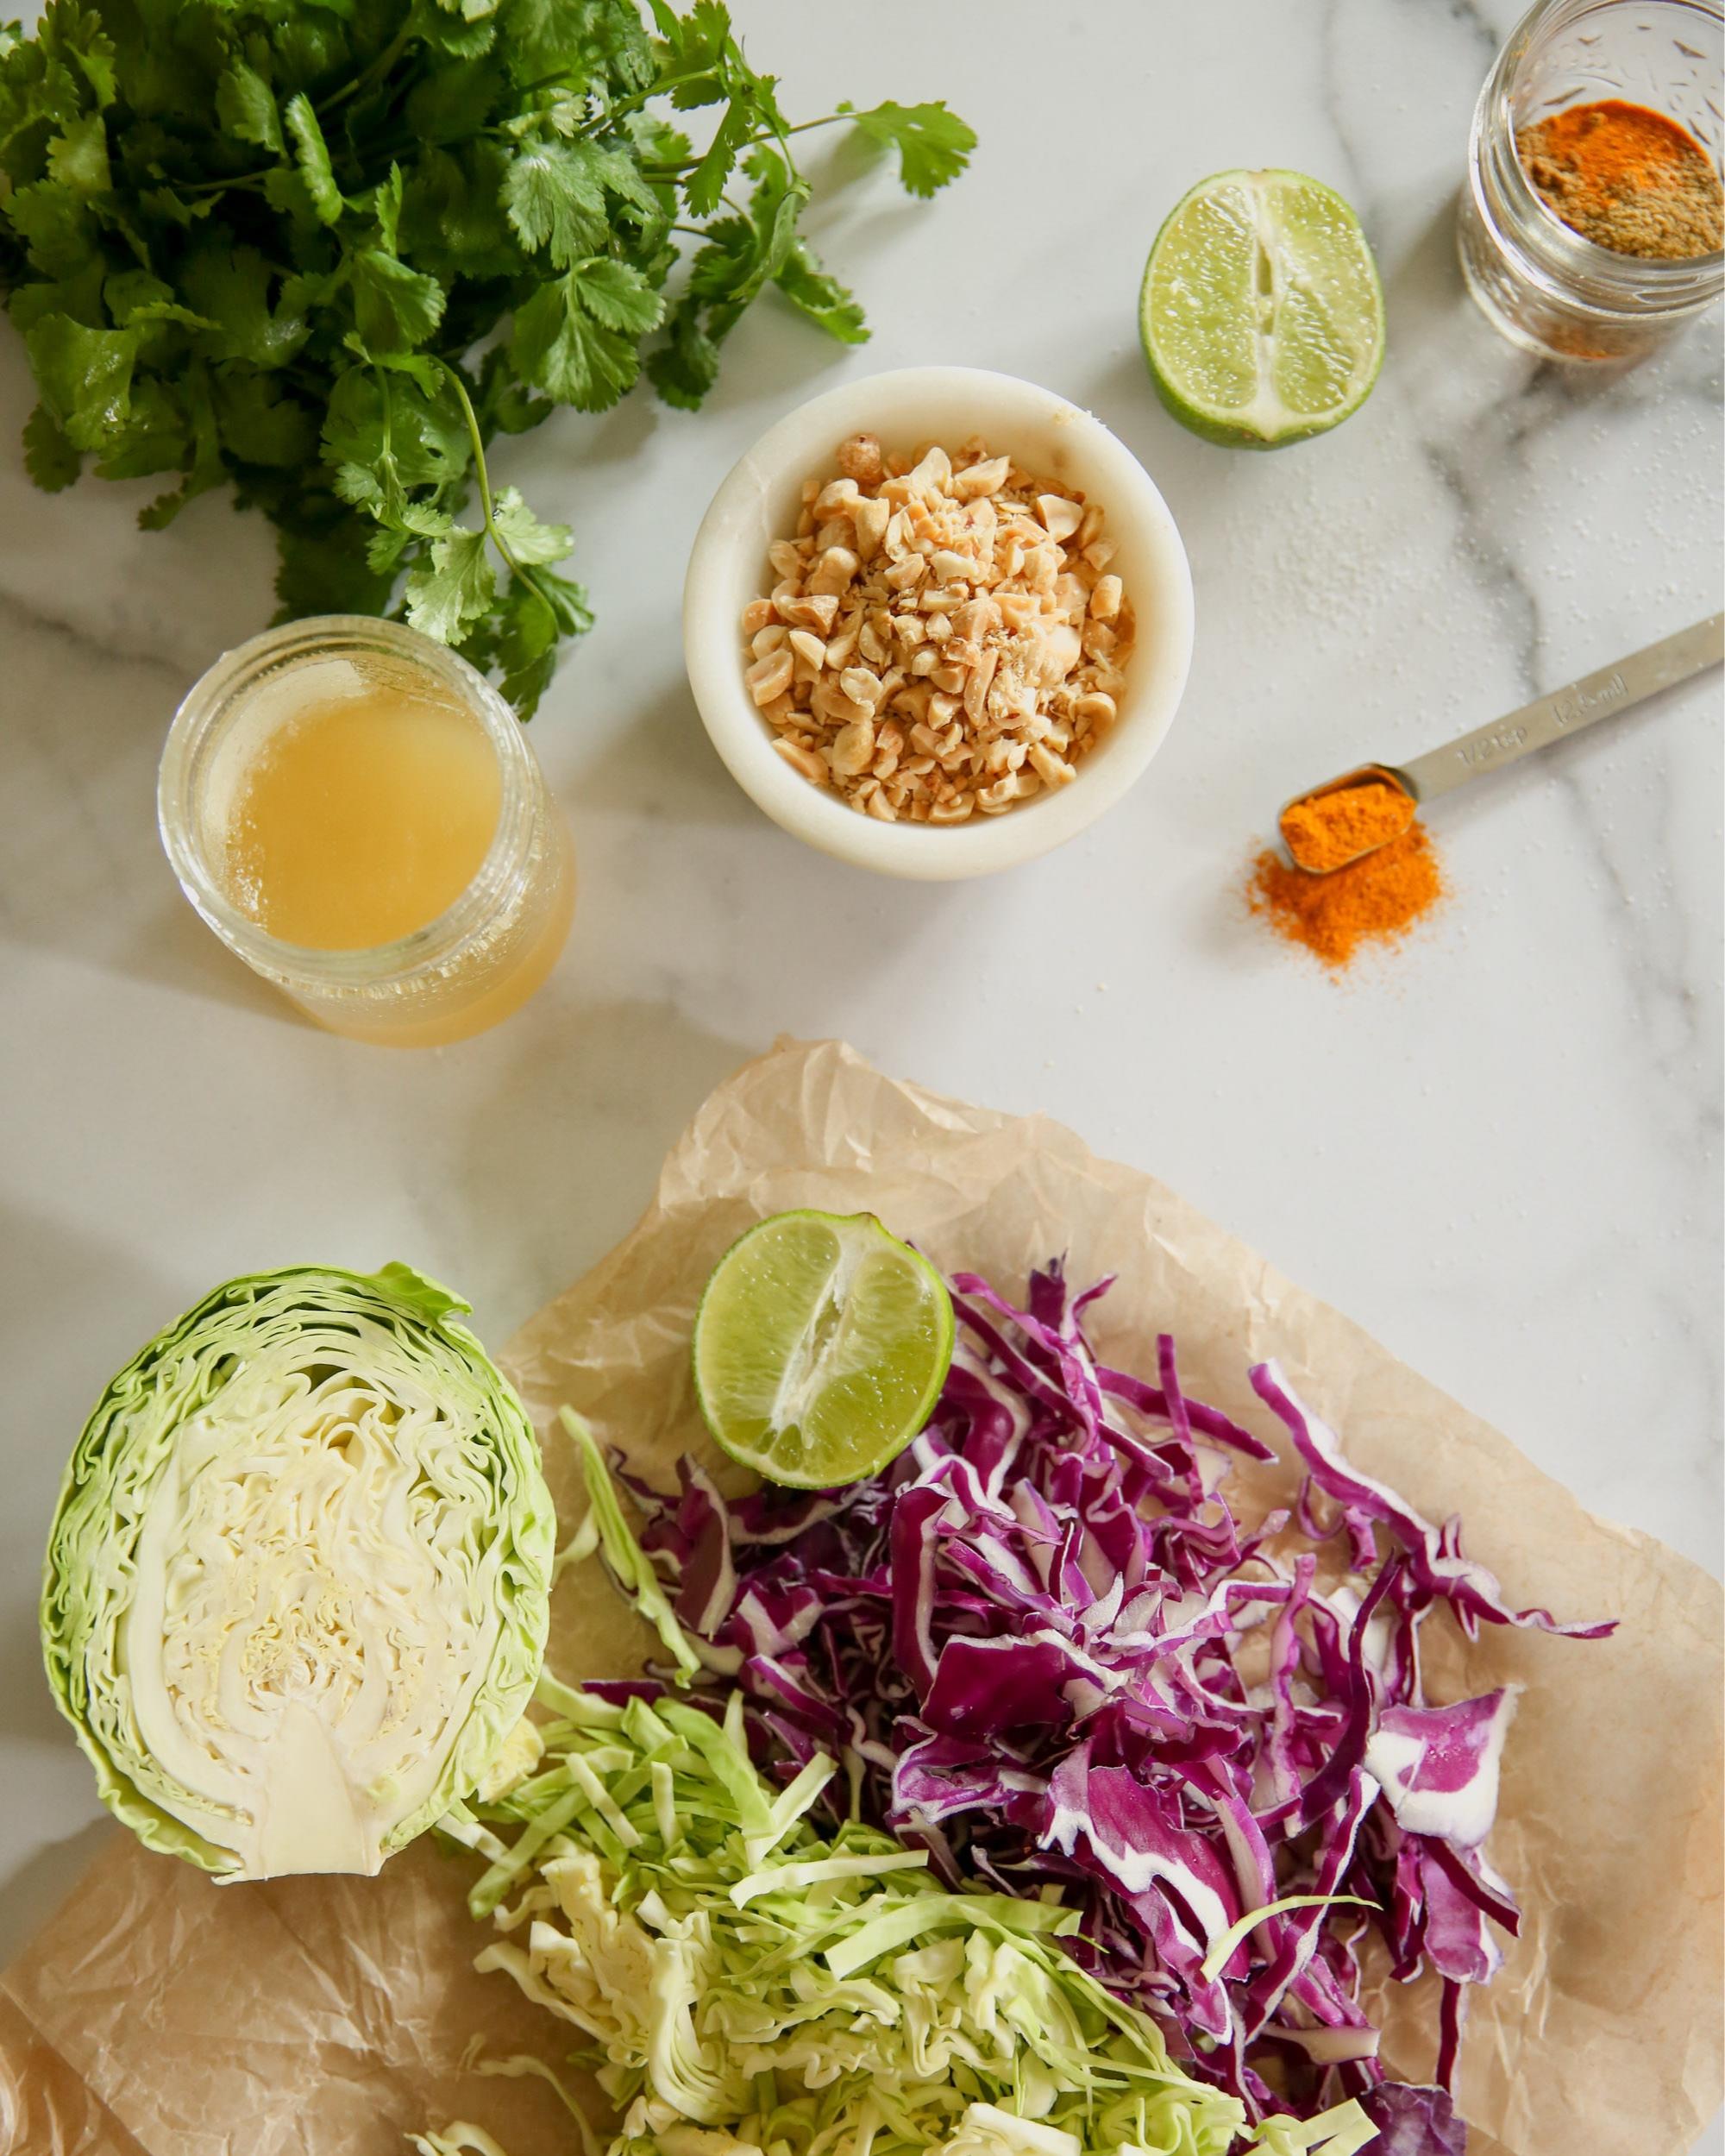 Mayo+Free+Coleslaw+Ingredients